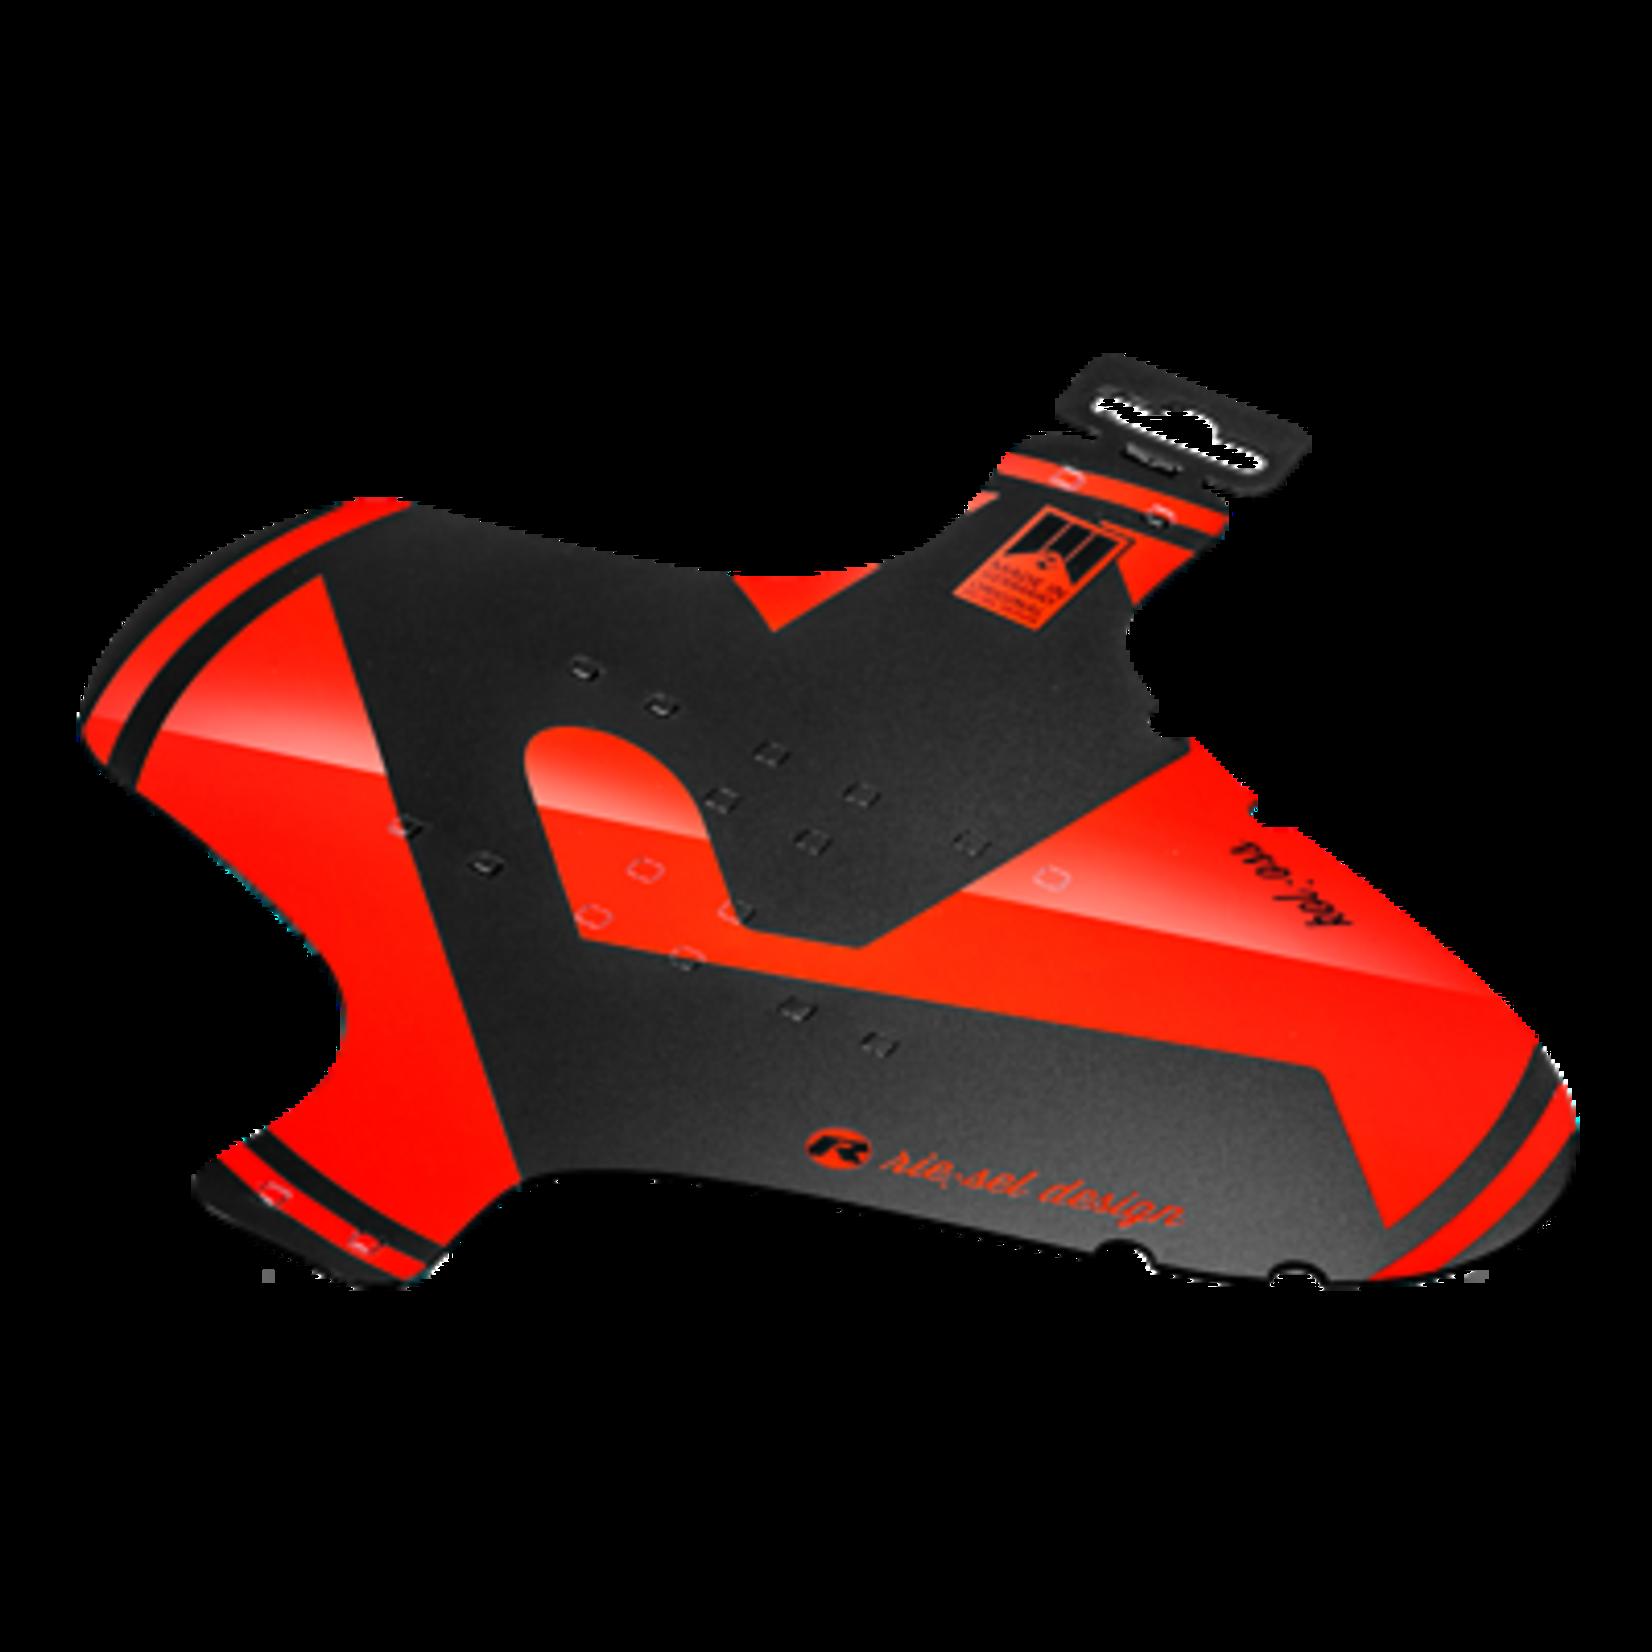 Rie Sel Design Schutzbleche Vorne fascette mudguard rosso